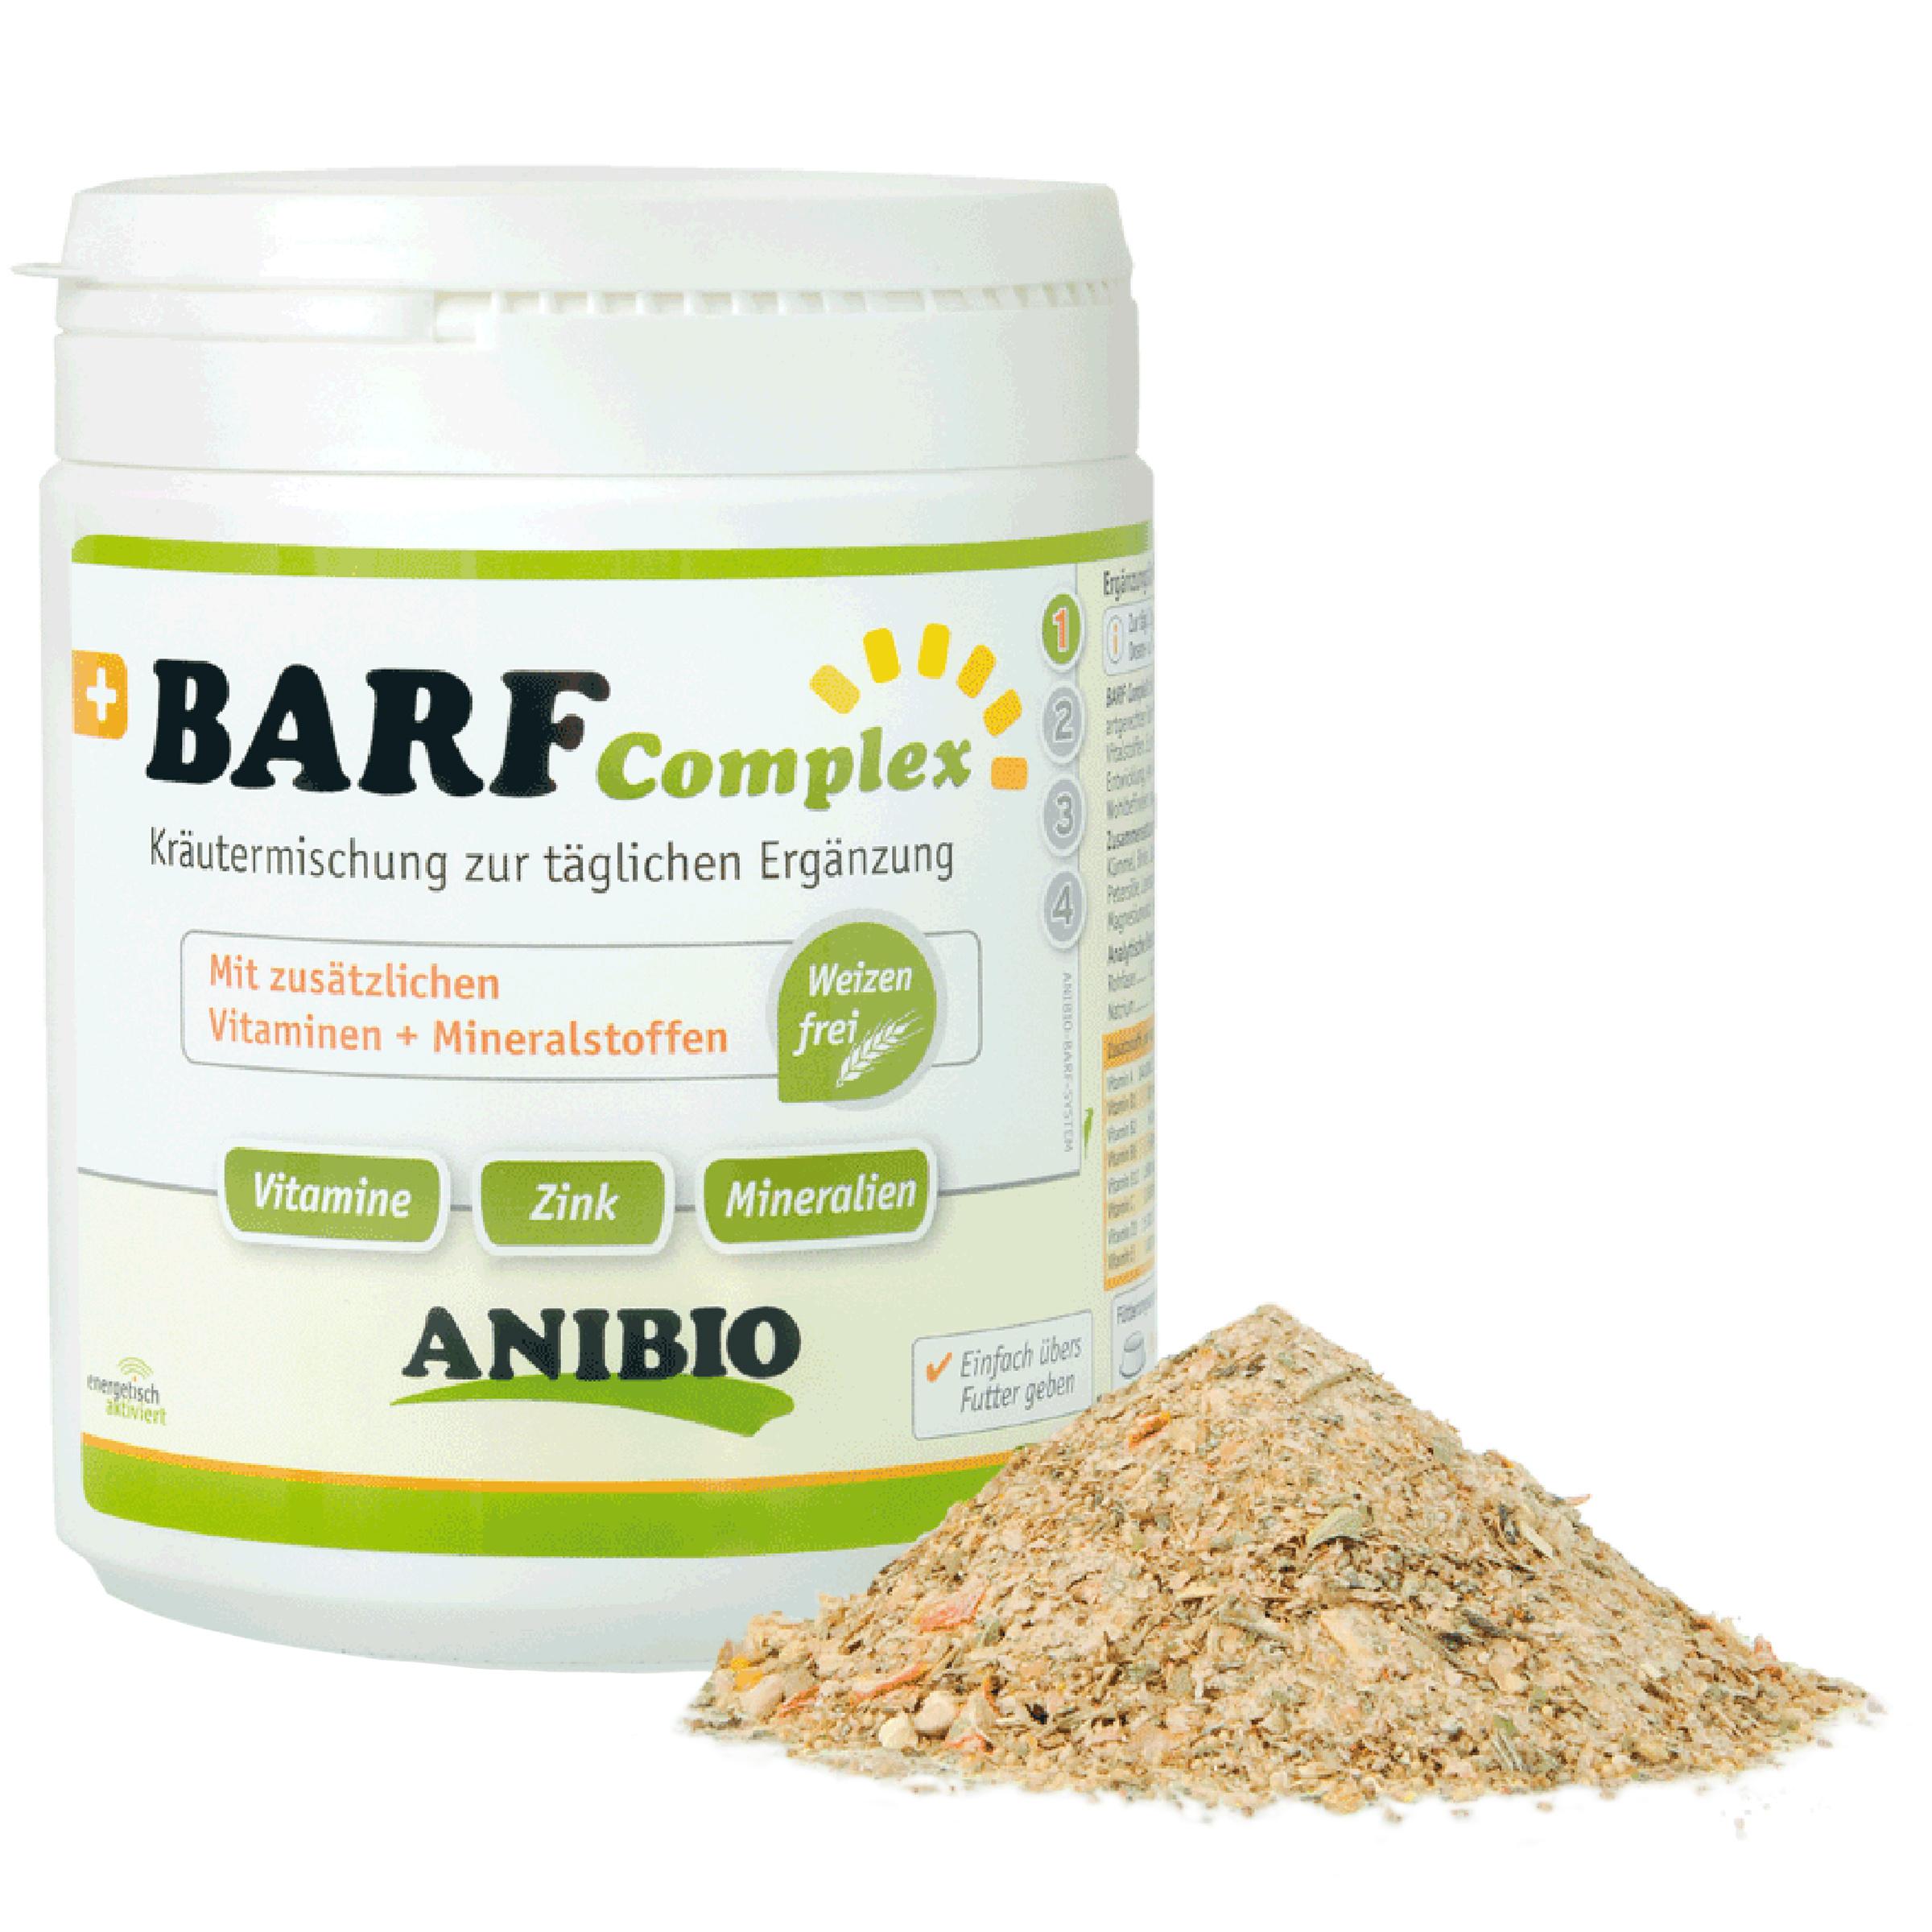 Image of Anibio BARF Complex Kräutermix 420g